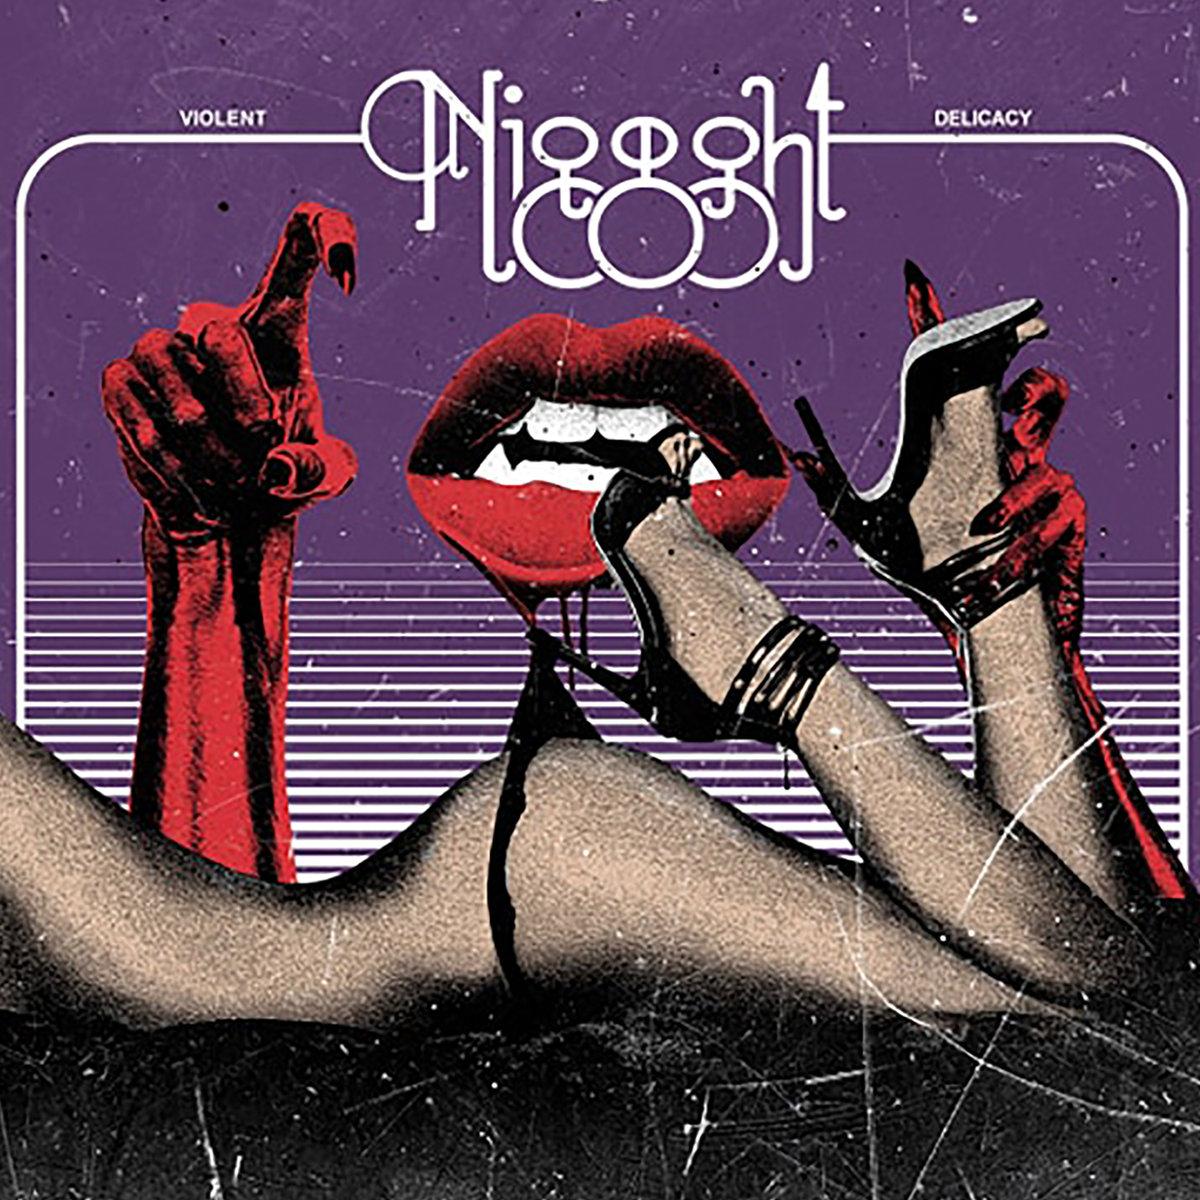 Niggght | Violent Delicacy